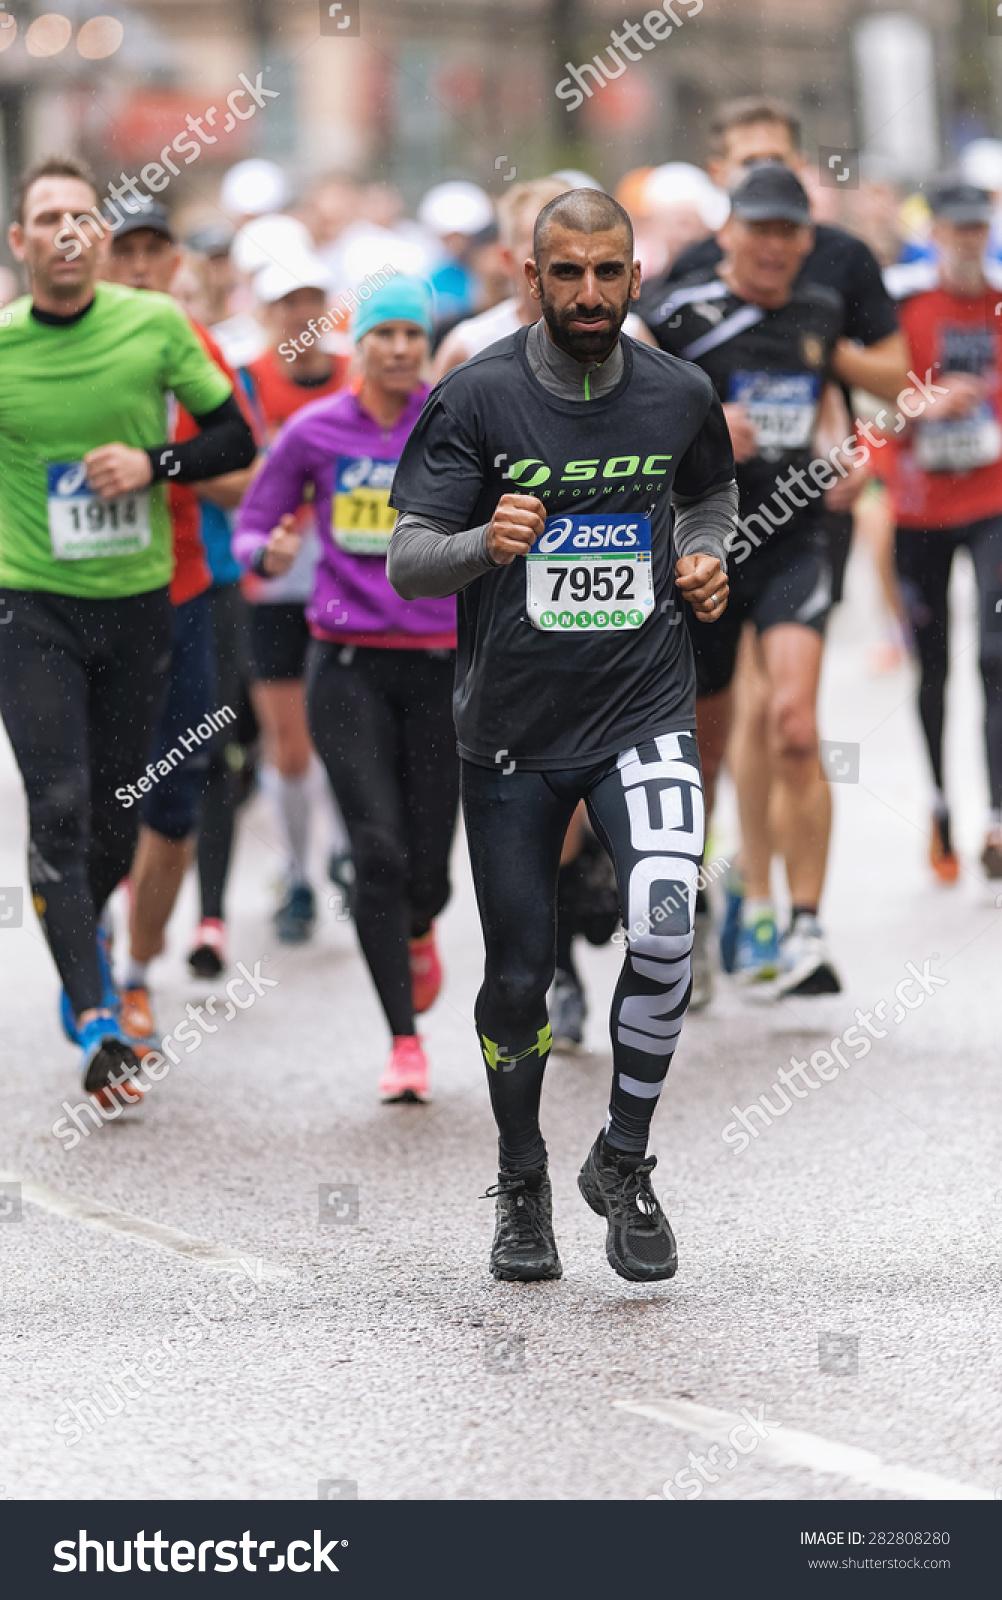 Asics Stockholm Marathon | Century City Athletic Club